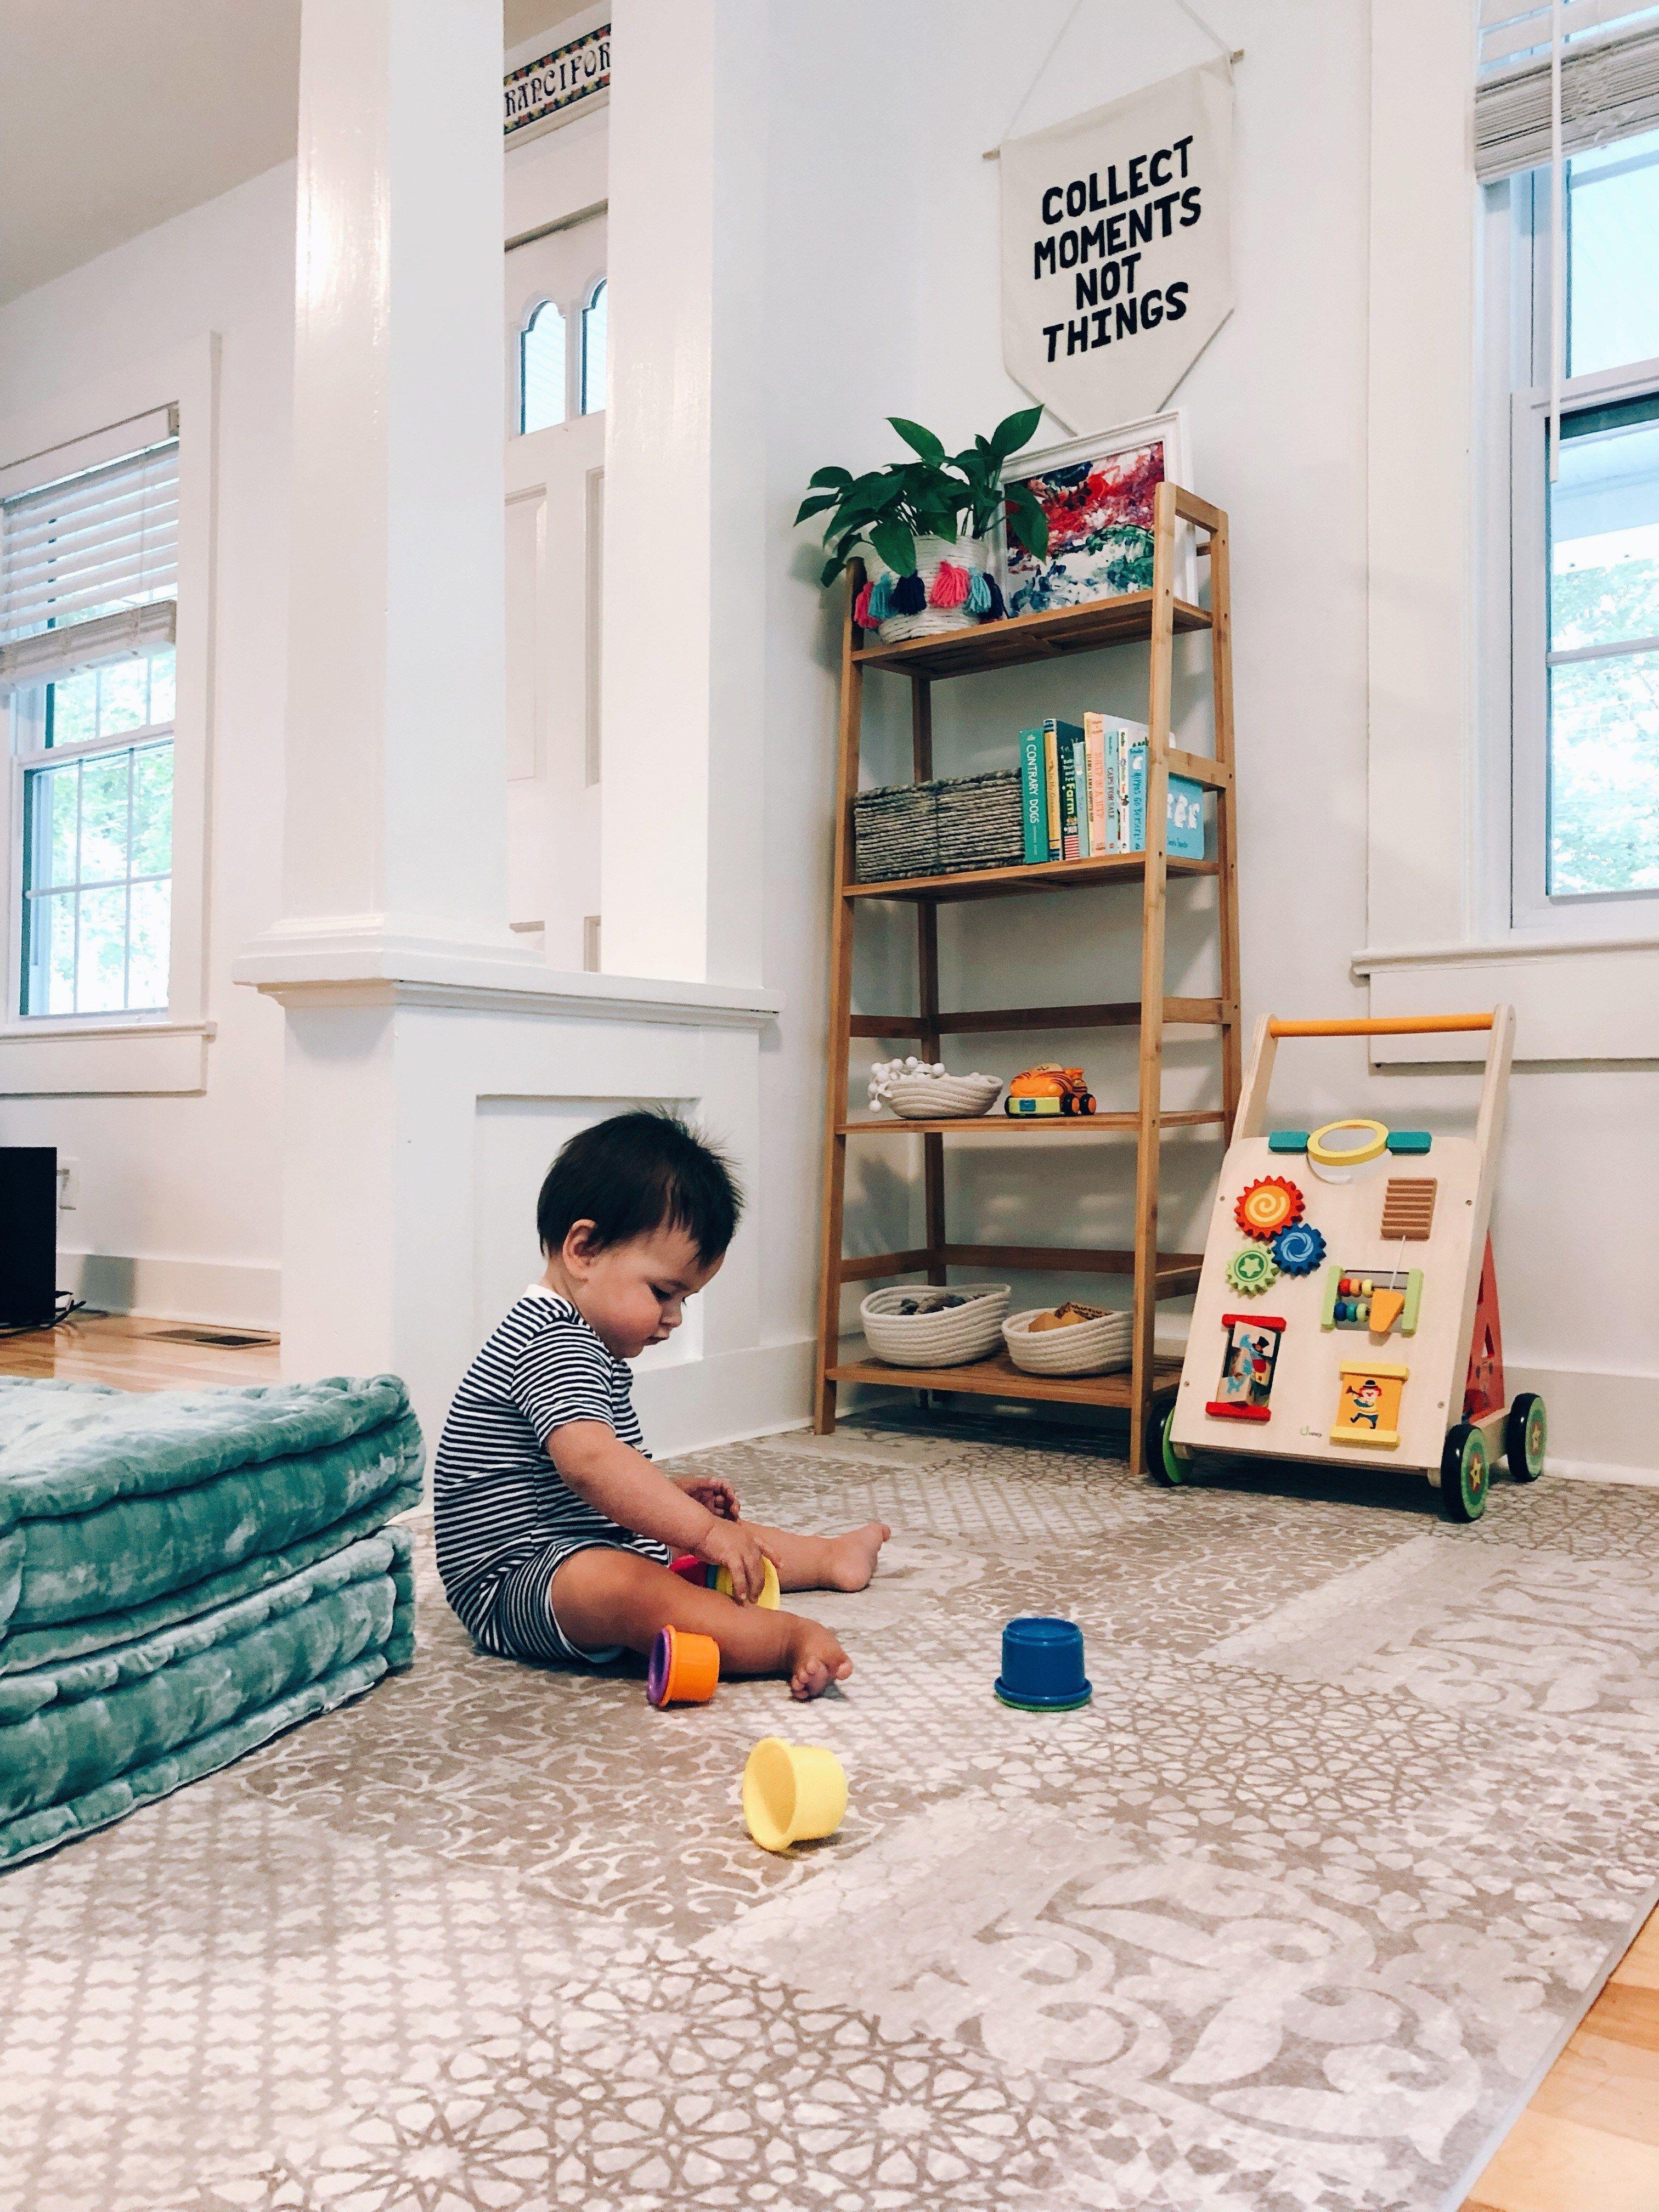 Baby Play Corner In Living Room Organization Ct Motherhood Blog Play Corner Living Room Organization Baby Play Areas #play #corner #in #living #room